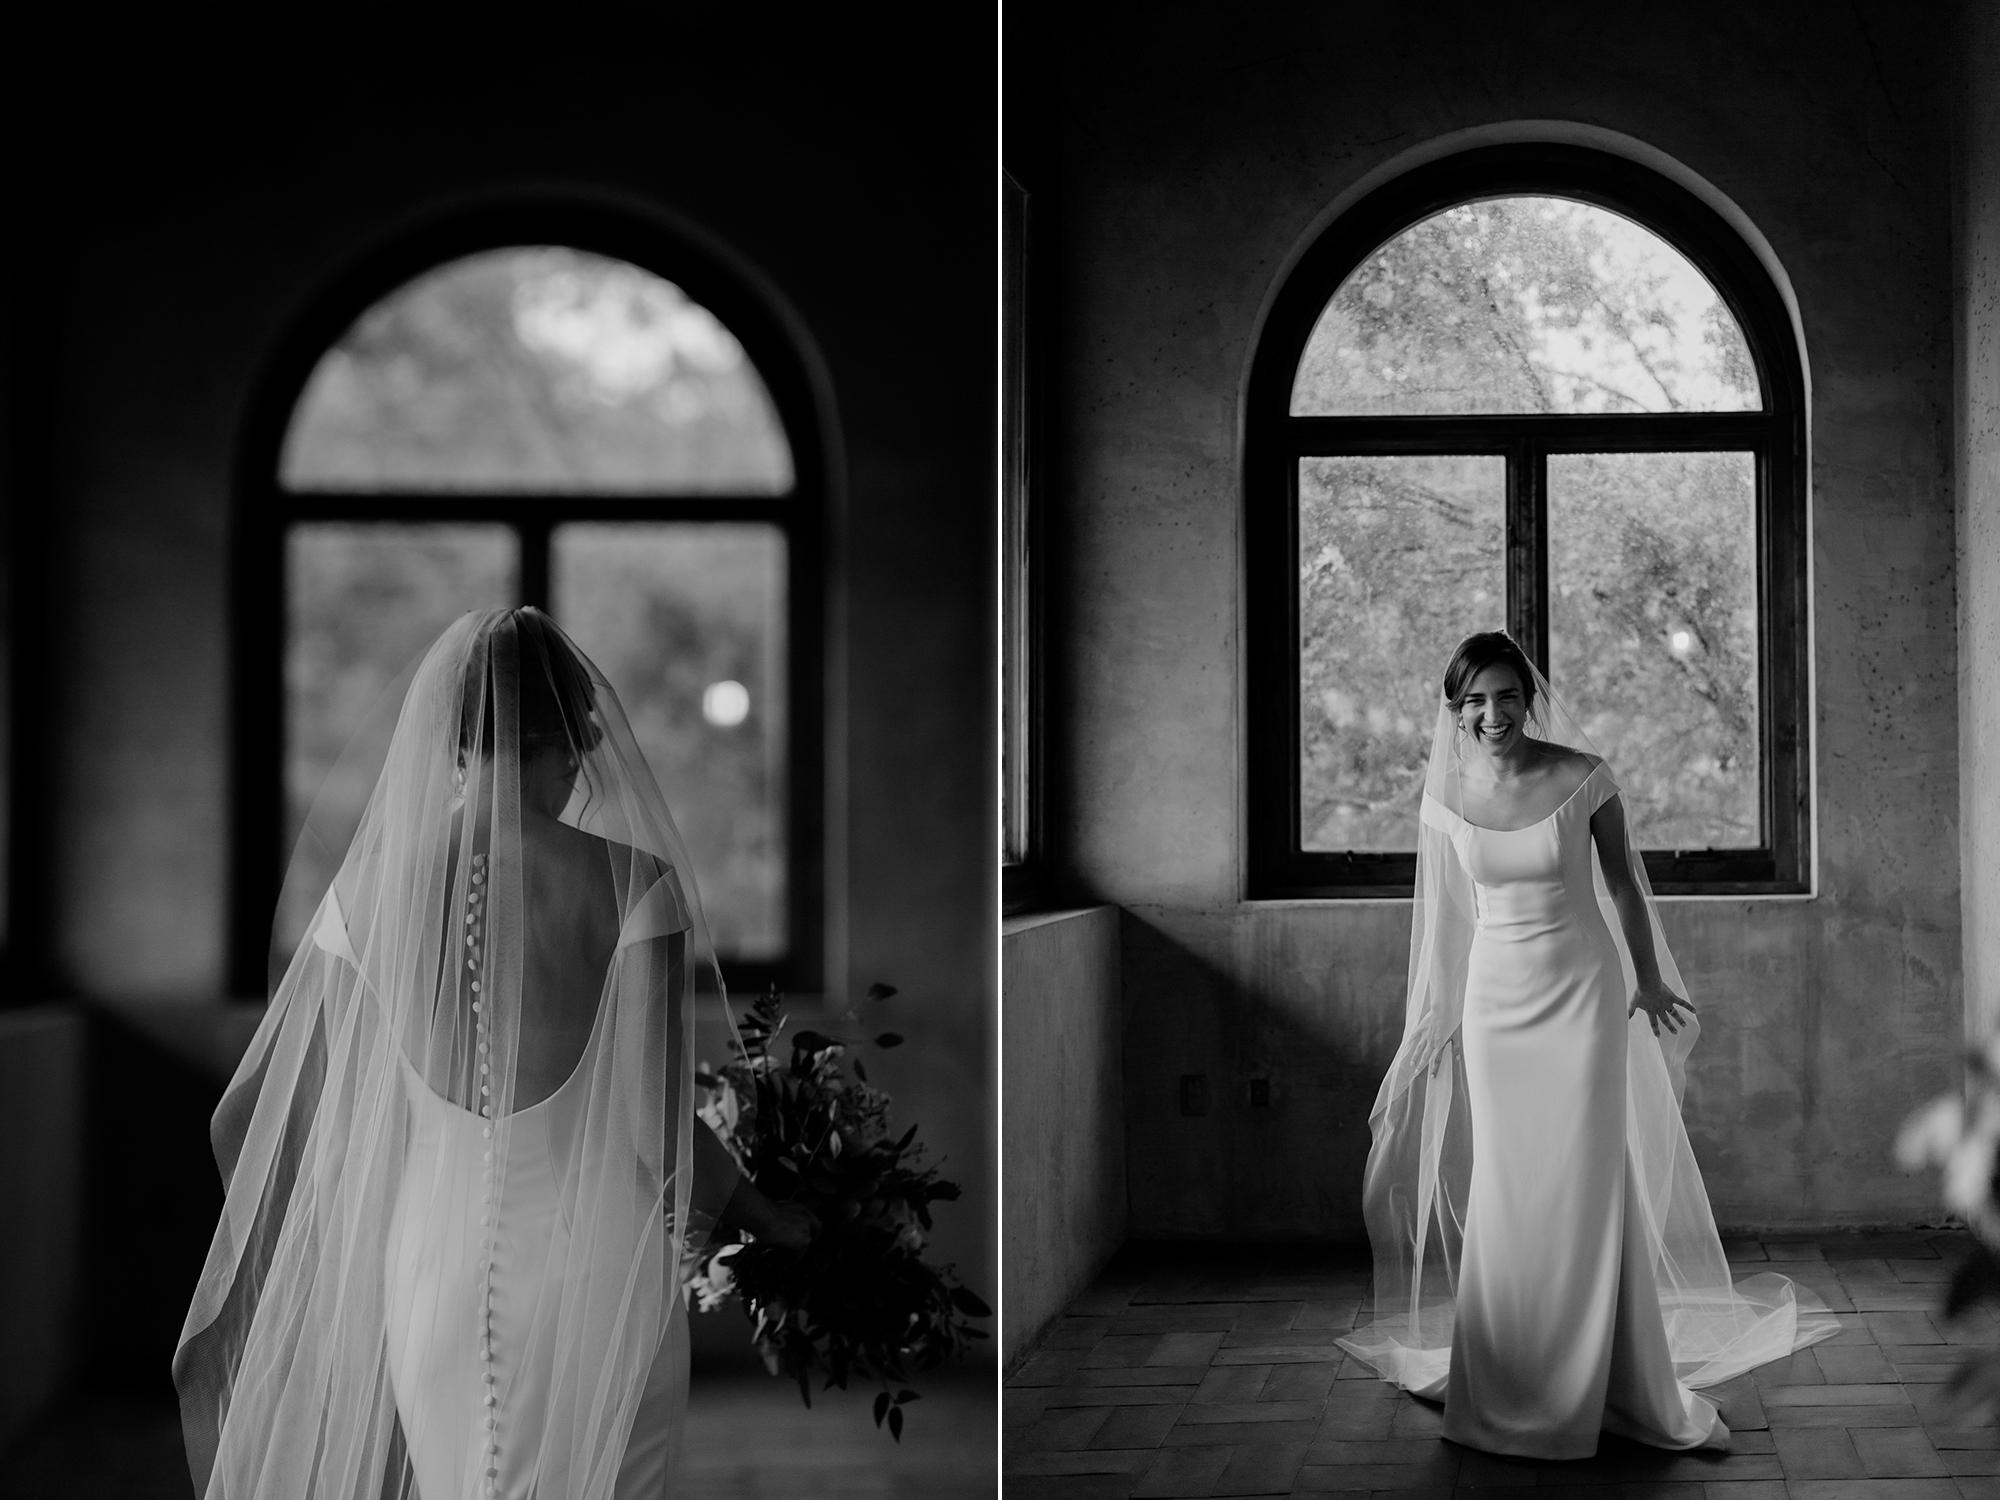 summerour-studio-alternative-wedding-photographer.jpg